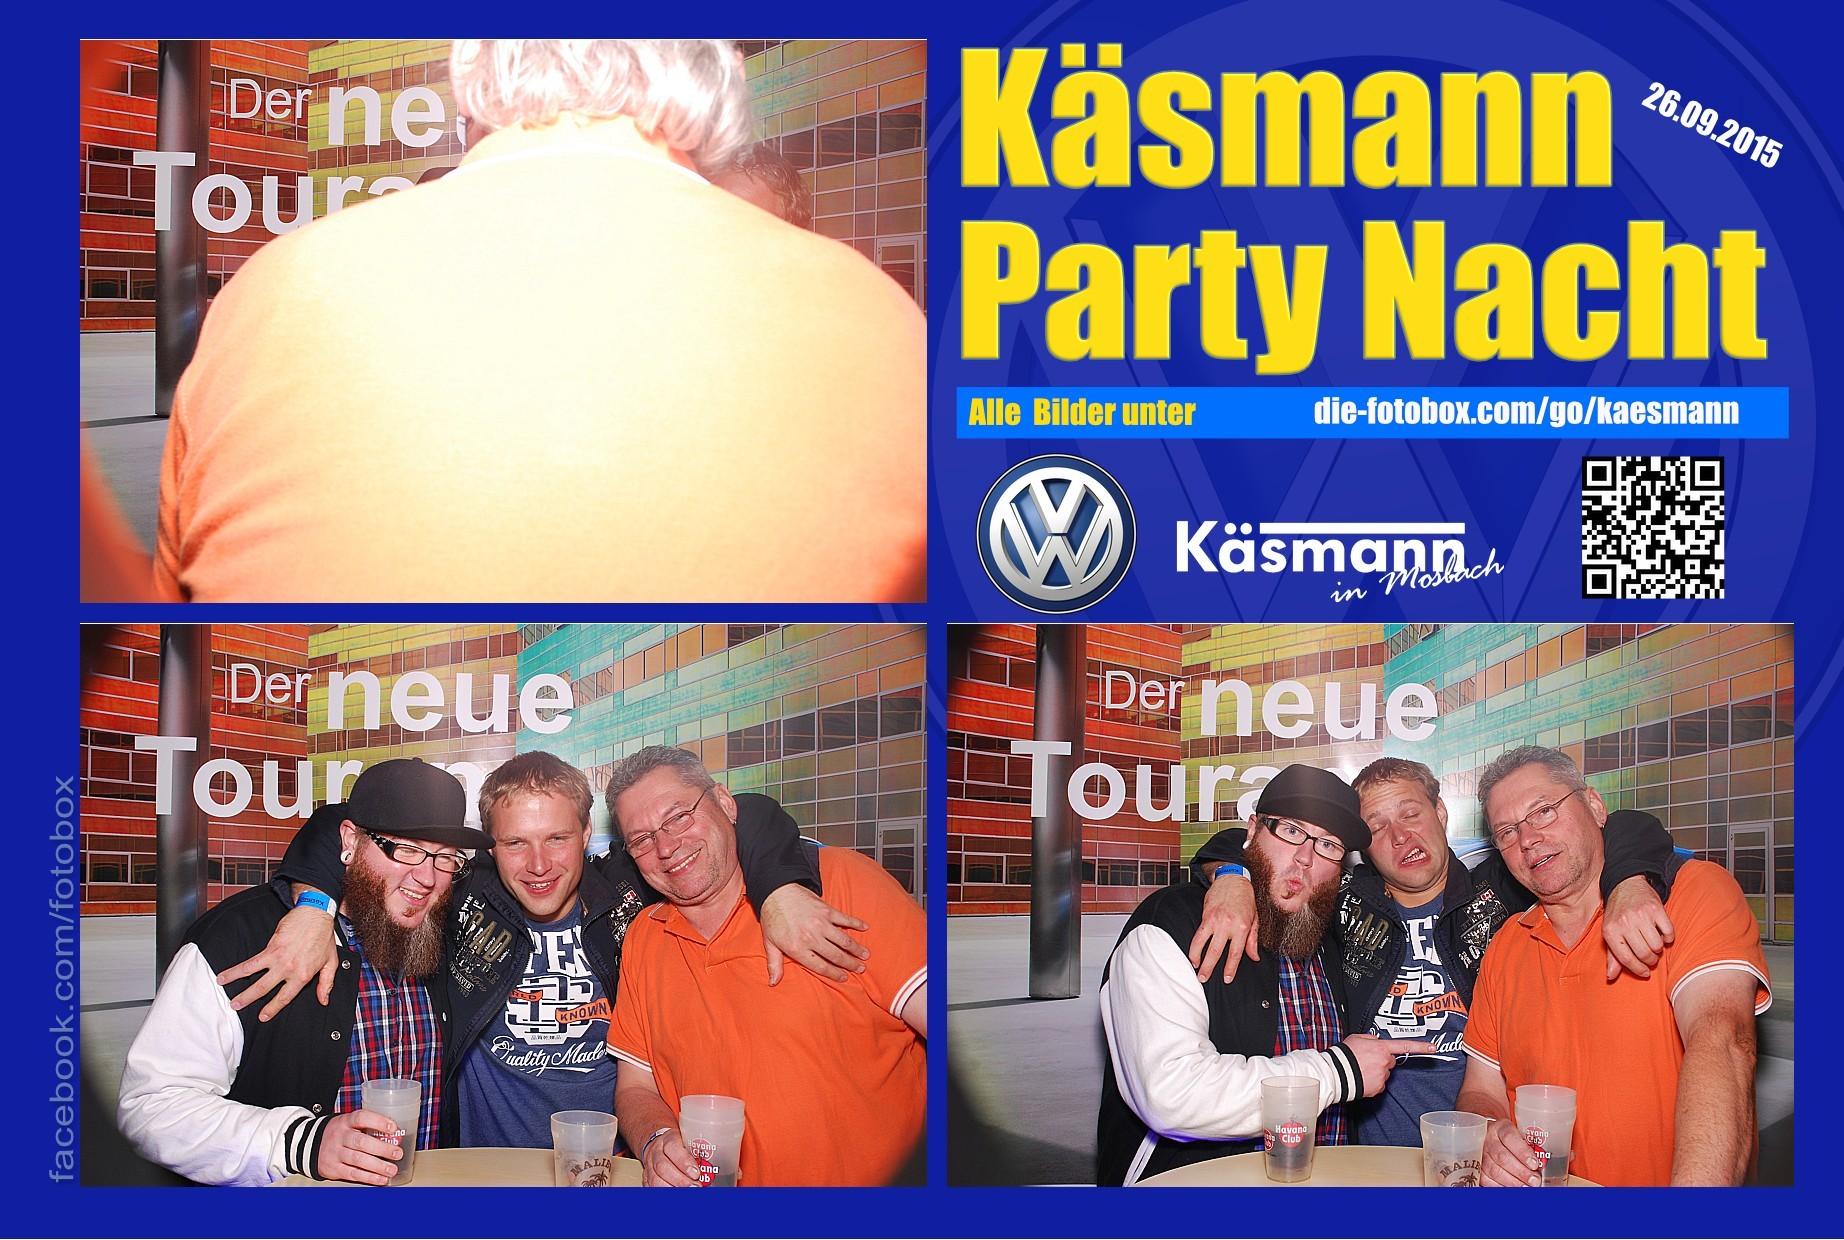 Käsmannparty 2015 - www.die-fotobox.com 01236